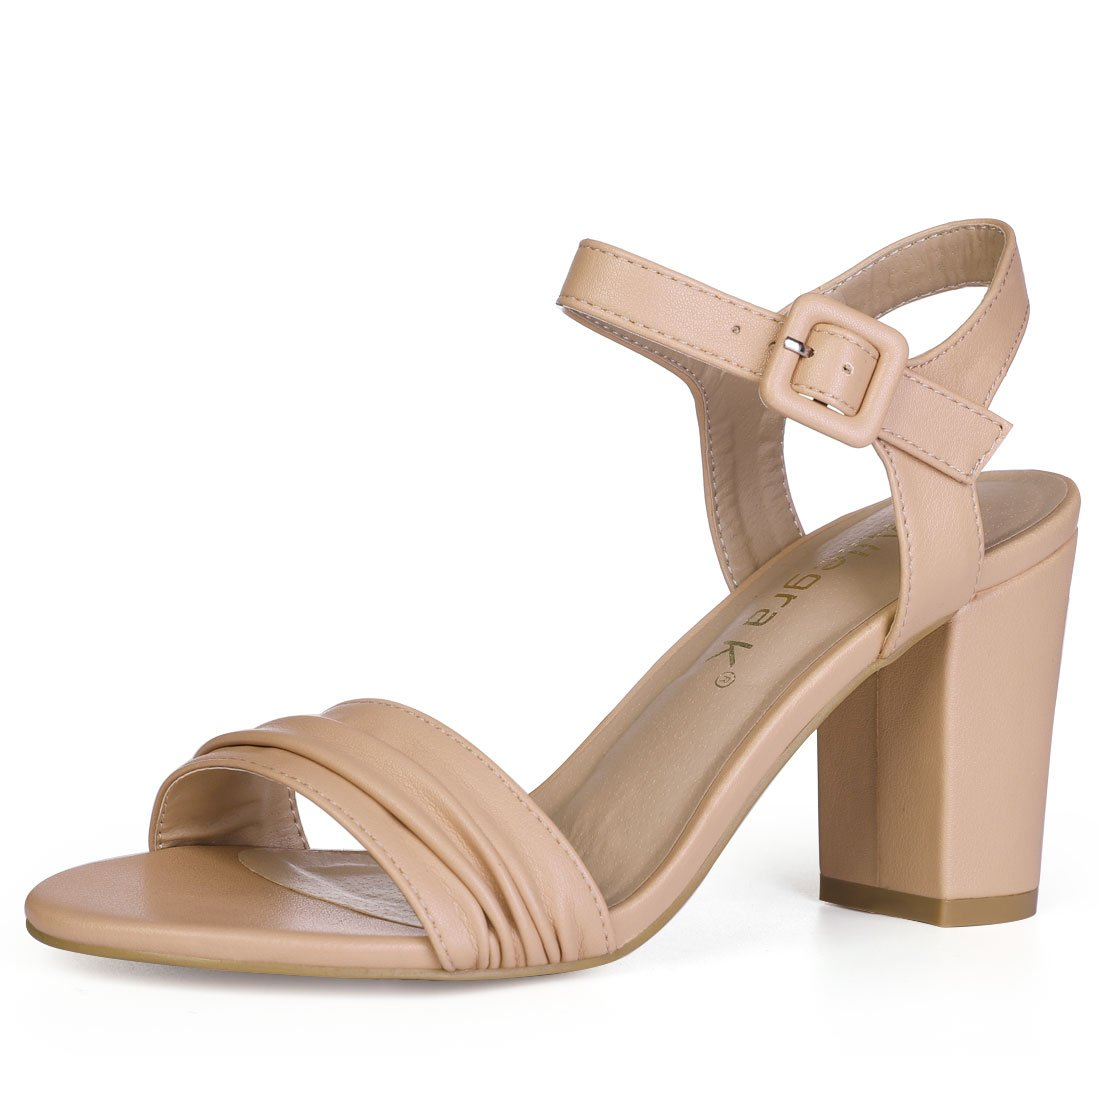 f9003c6c9 Allegra K Women s Ankle Strap Light Brown Sandals - 9.5 M US